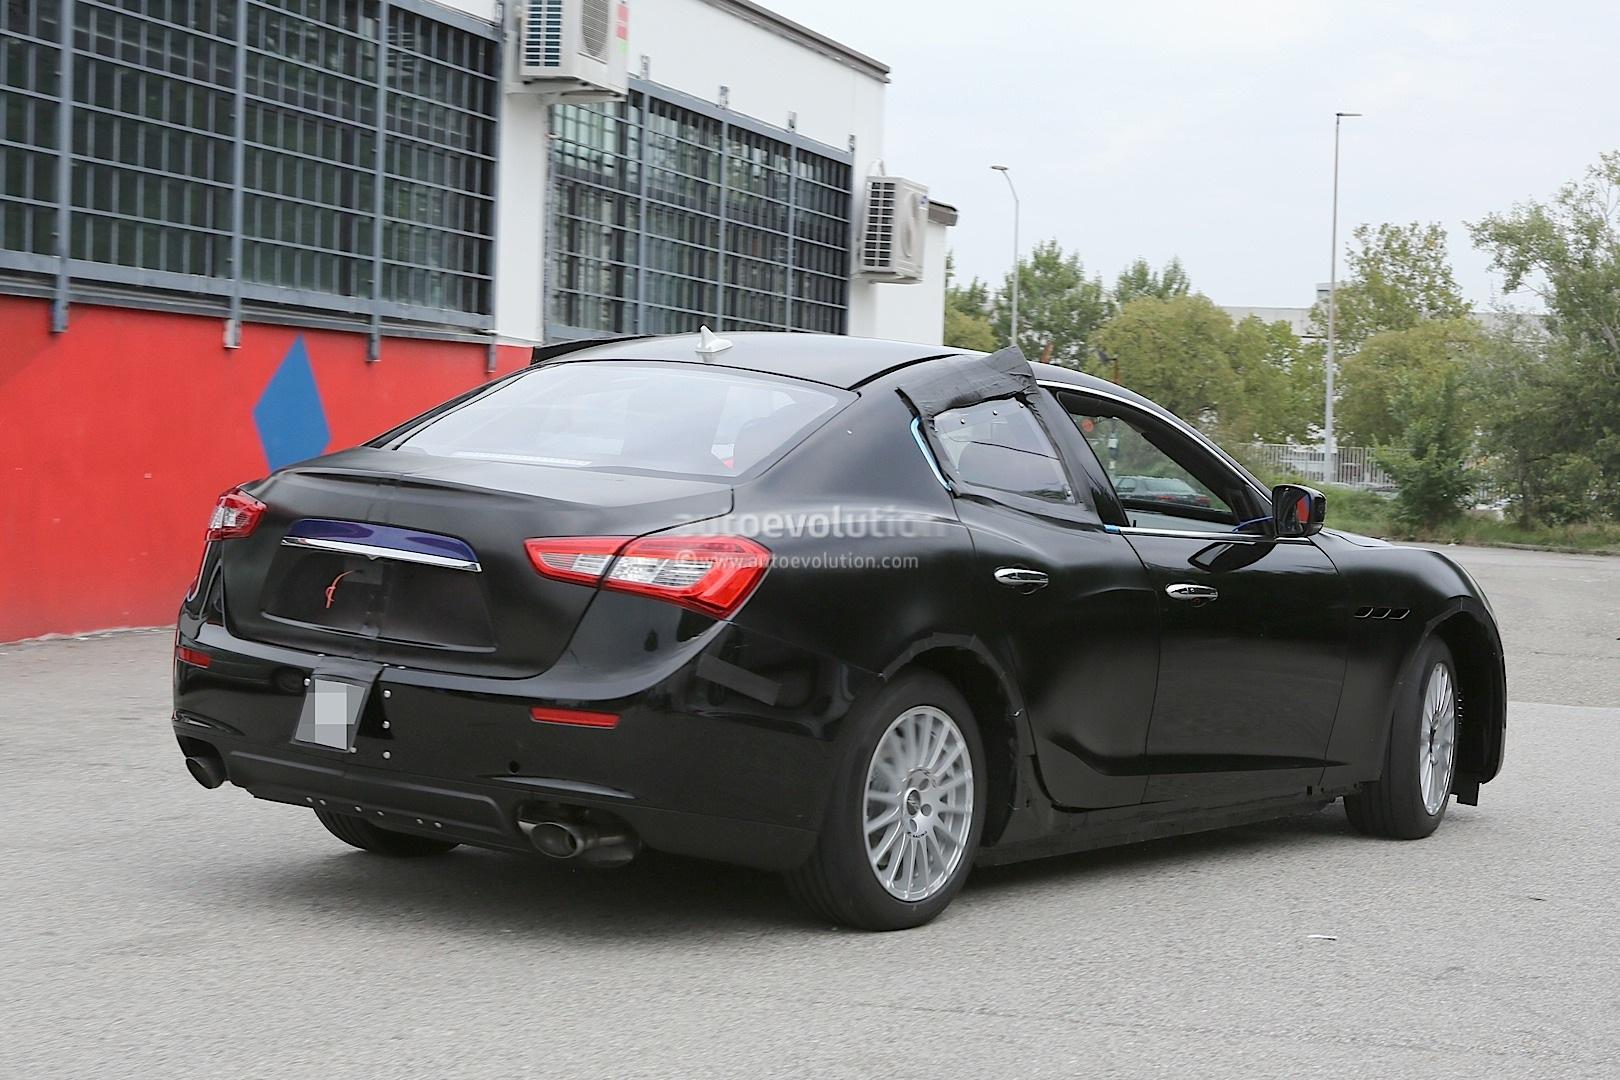 2016 Maserati Ghibli Spyshots